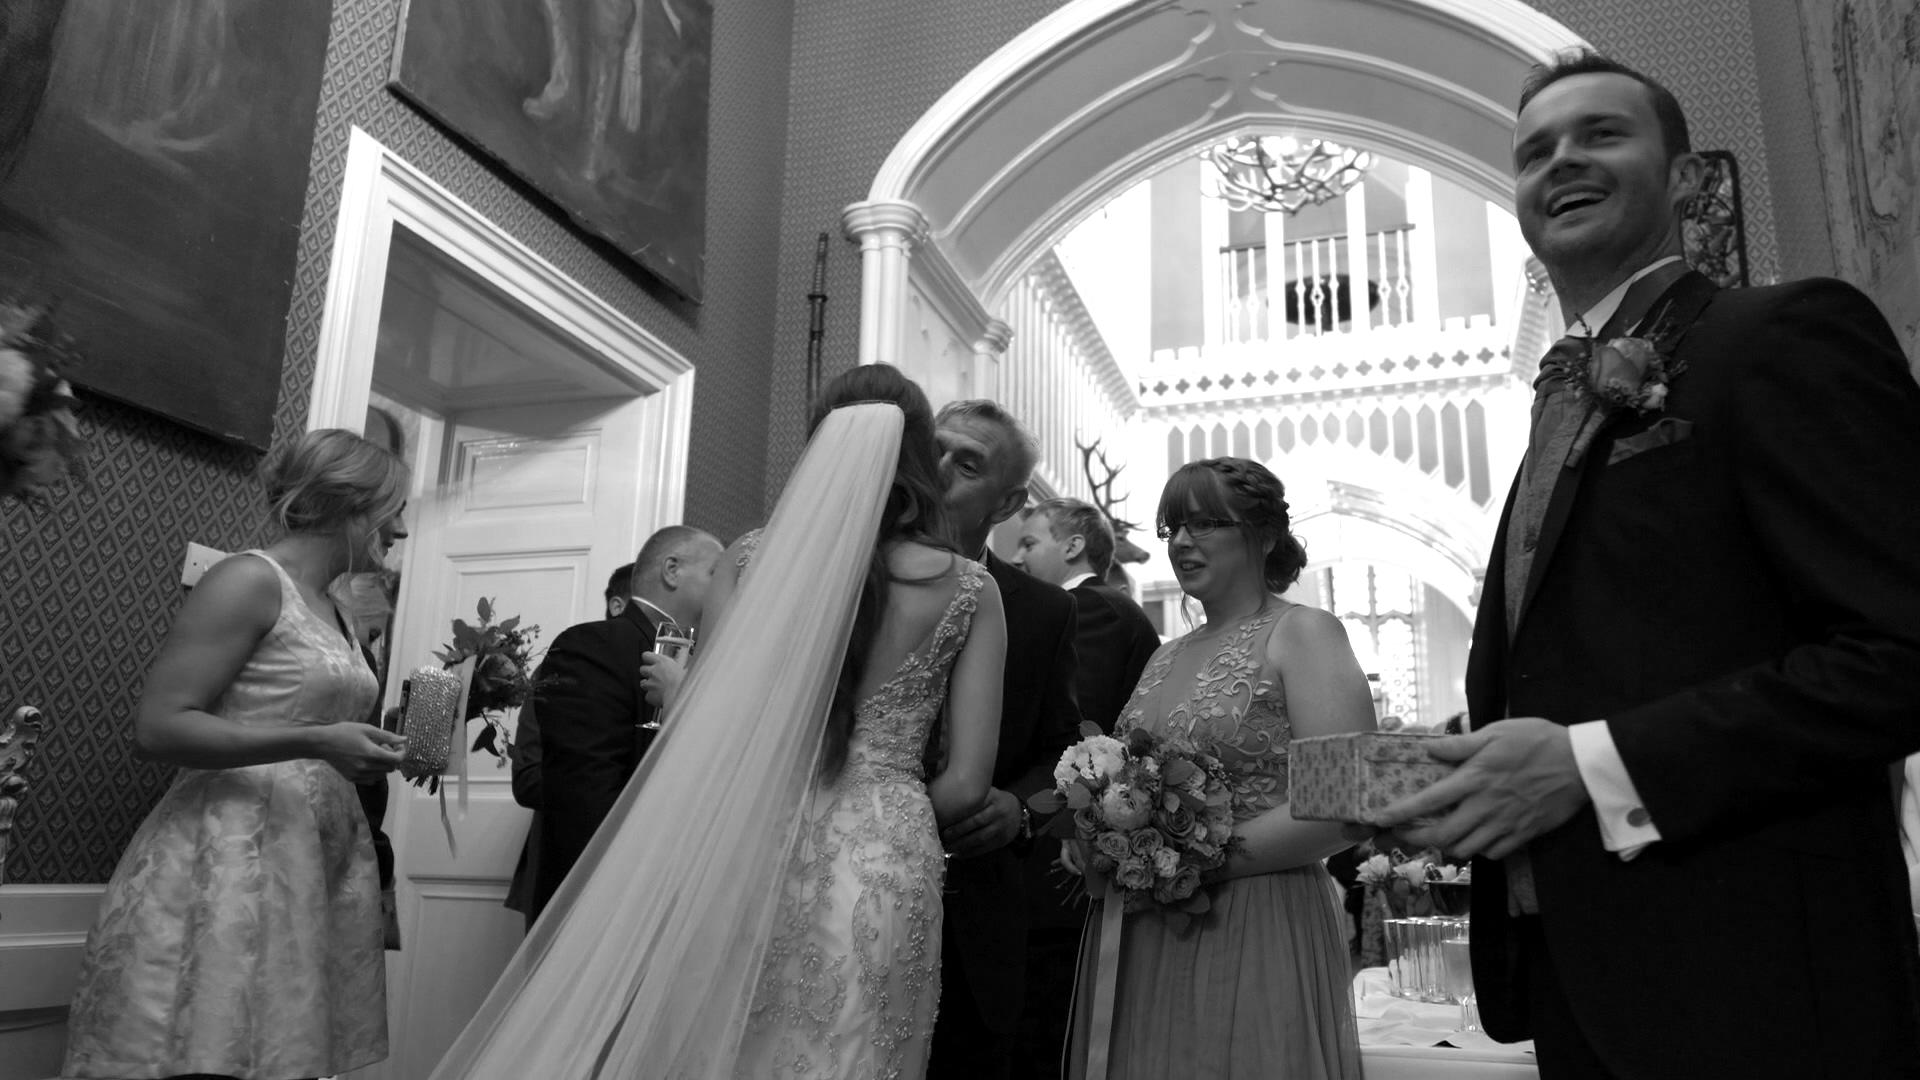 DRUMTOCHTY-SUMMER-WEDDING (16).jpg